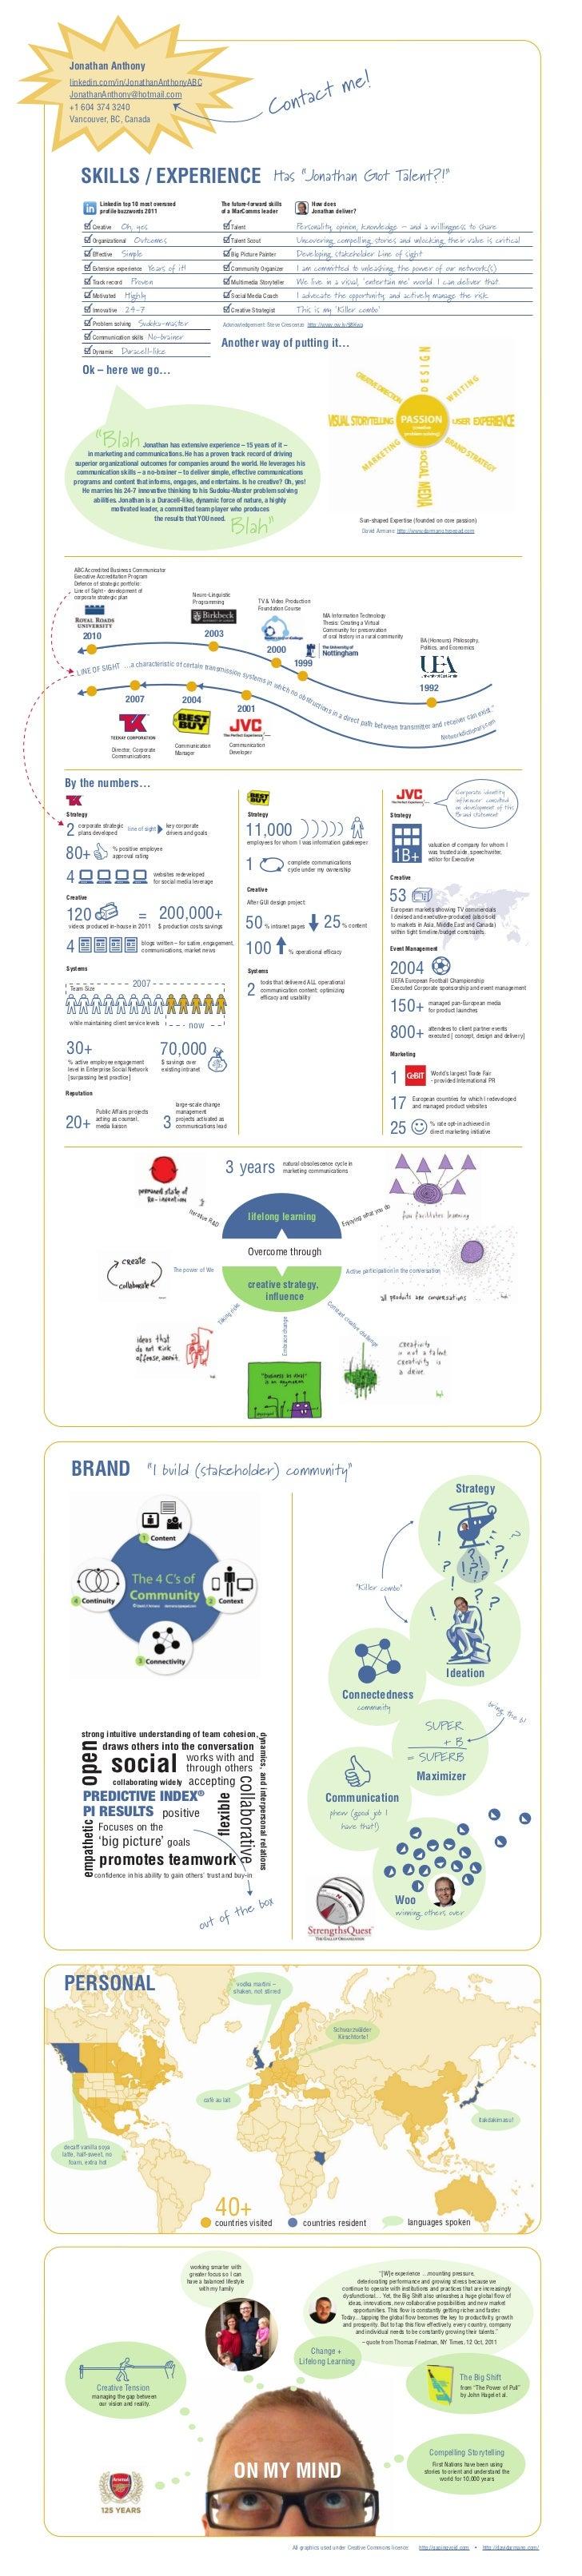 Infographic Resume - Jonathan Anthony